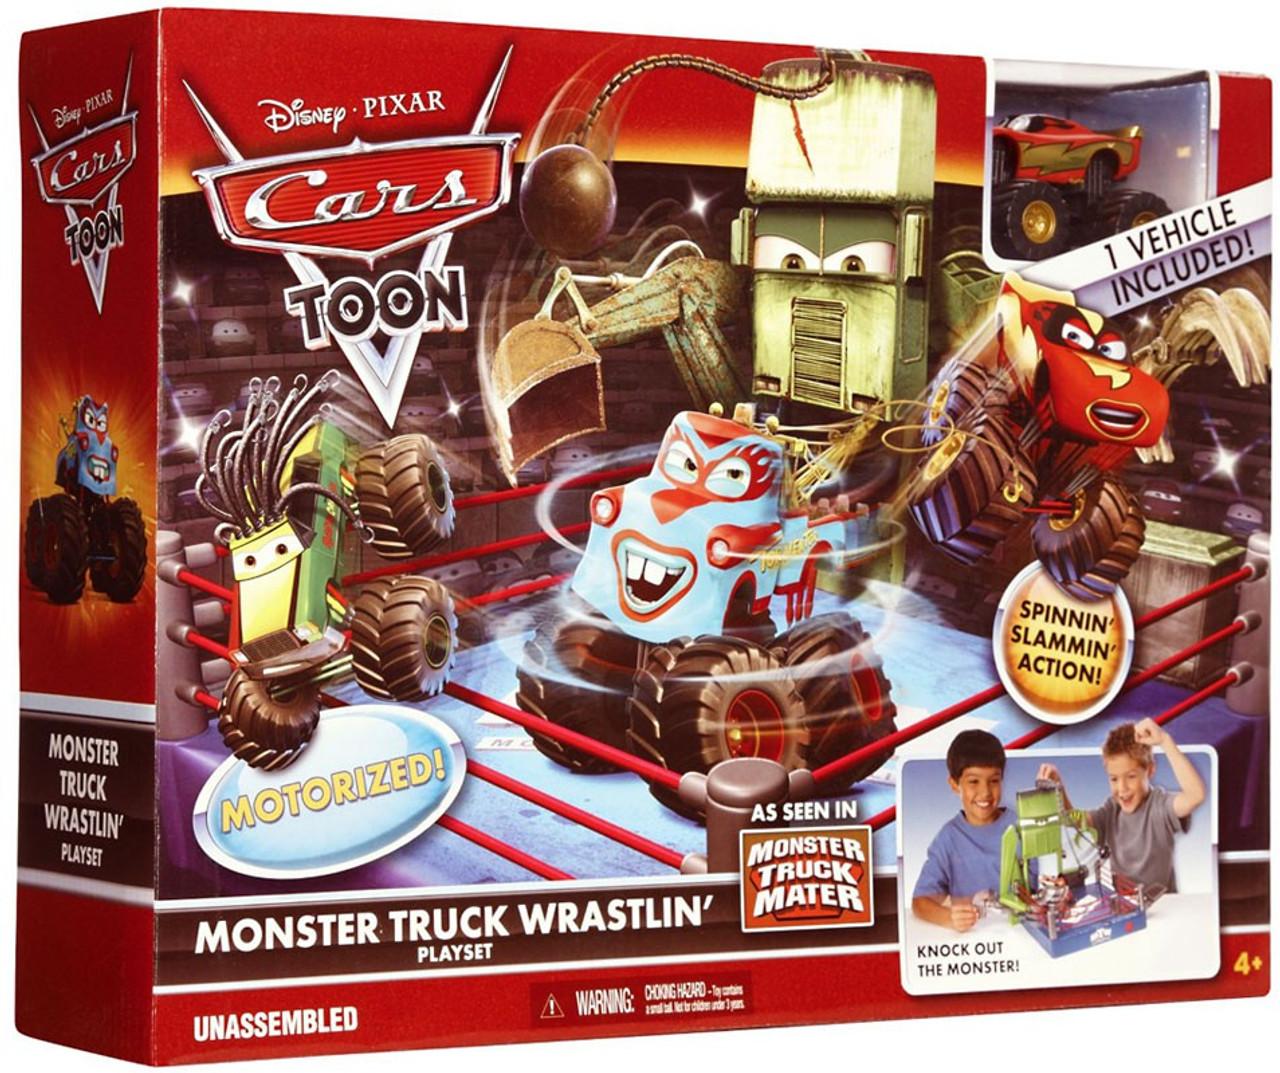 Disney Cars Cars Toon Playsets Monster Truck Wrastlin' Playset